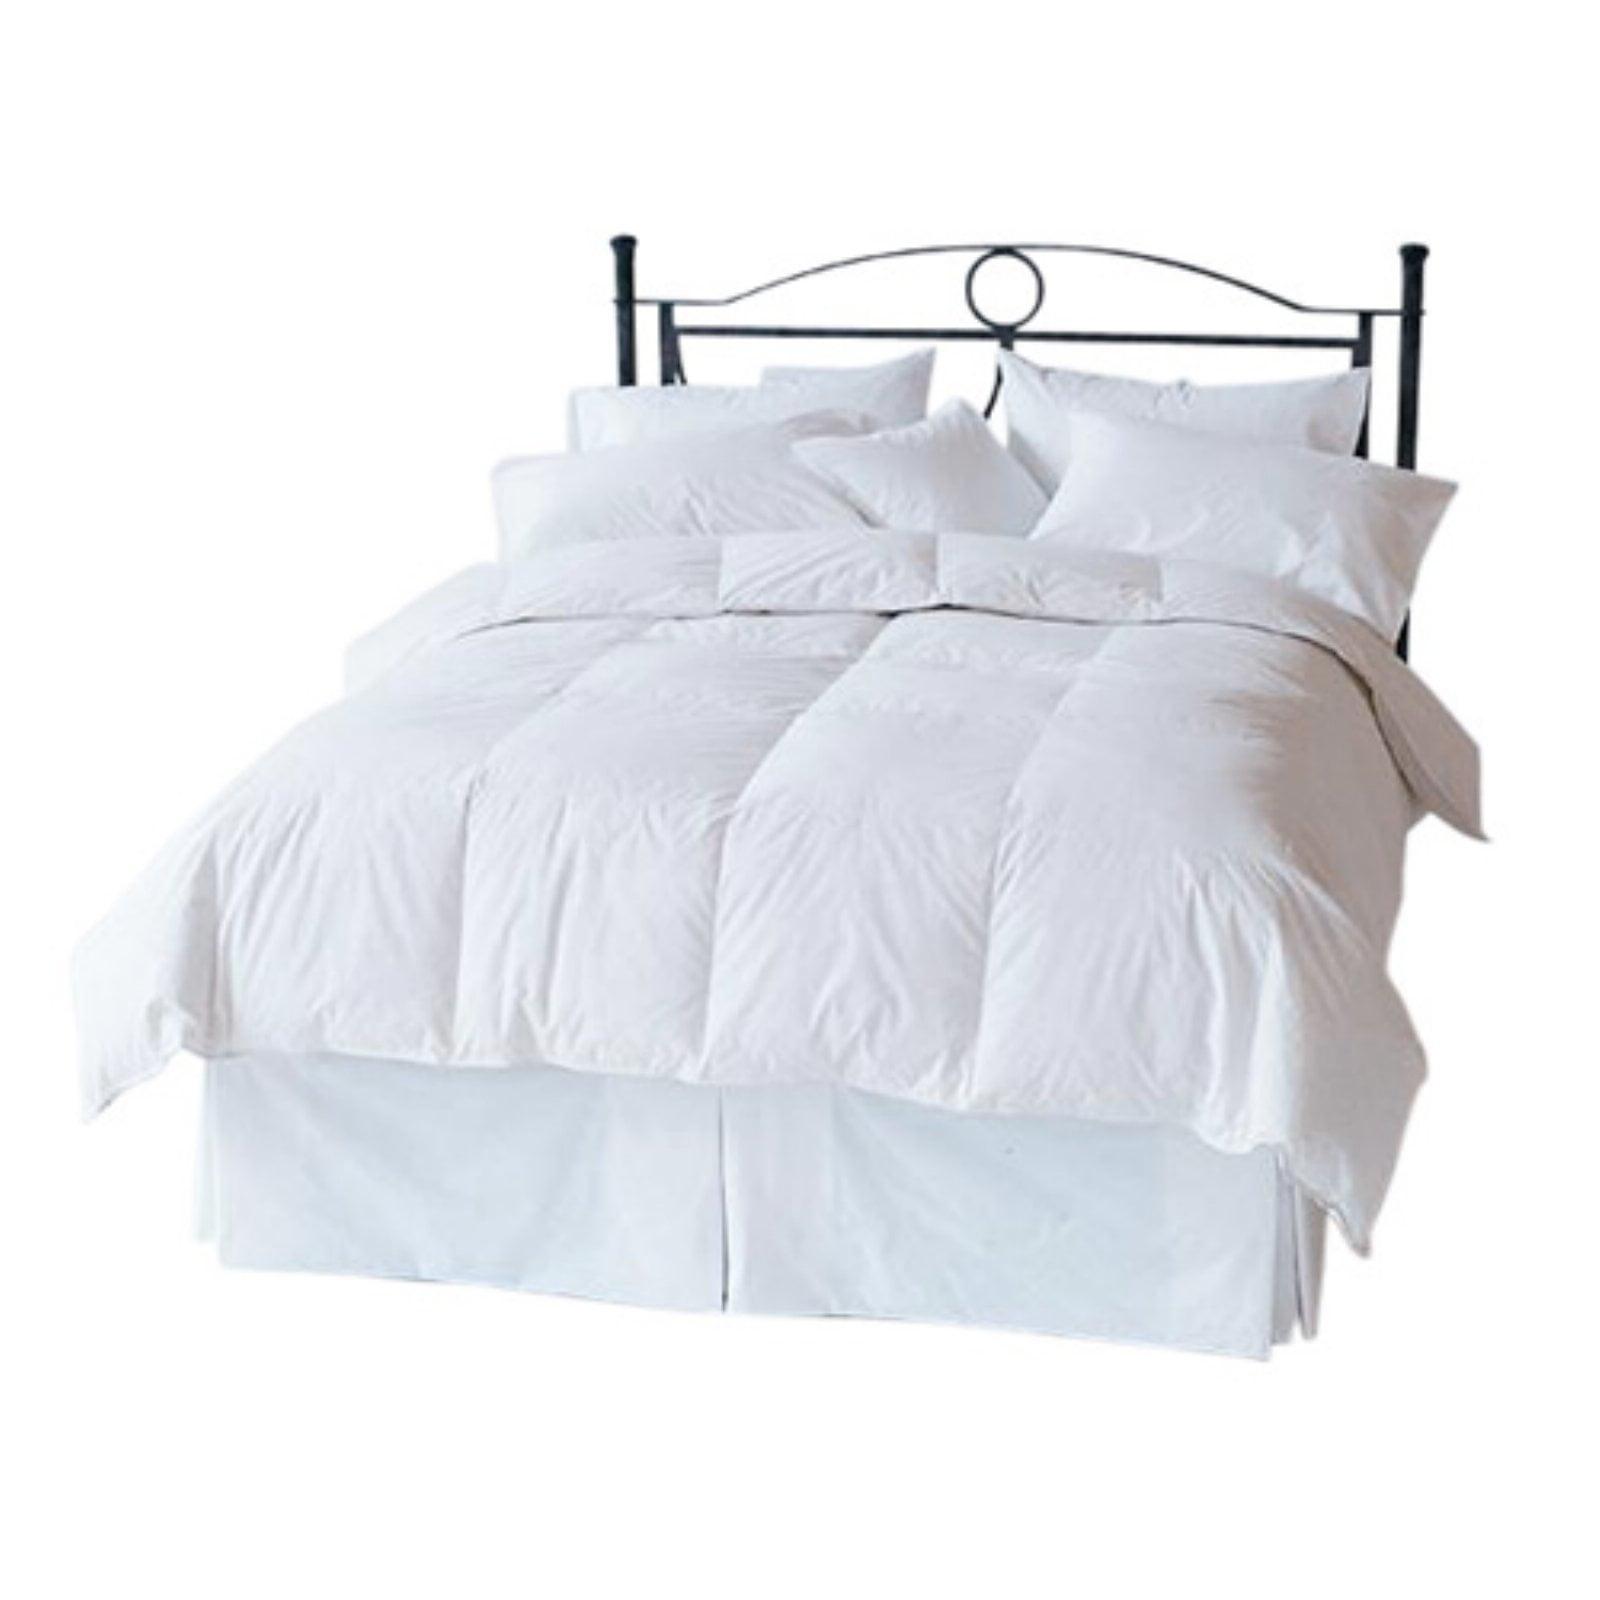 Daniadown Alpine Down Comforter - 4 Seasons